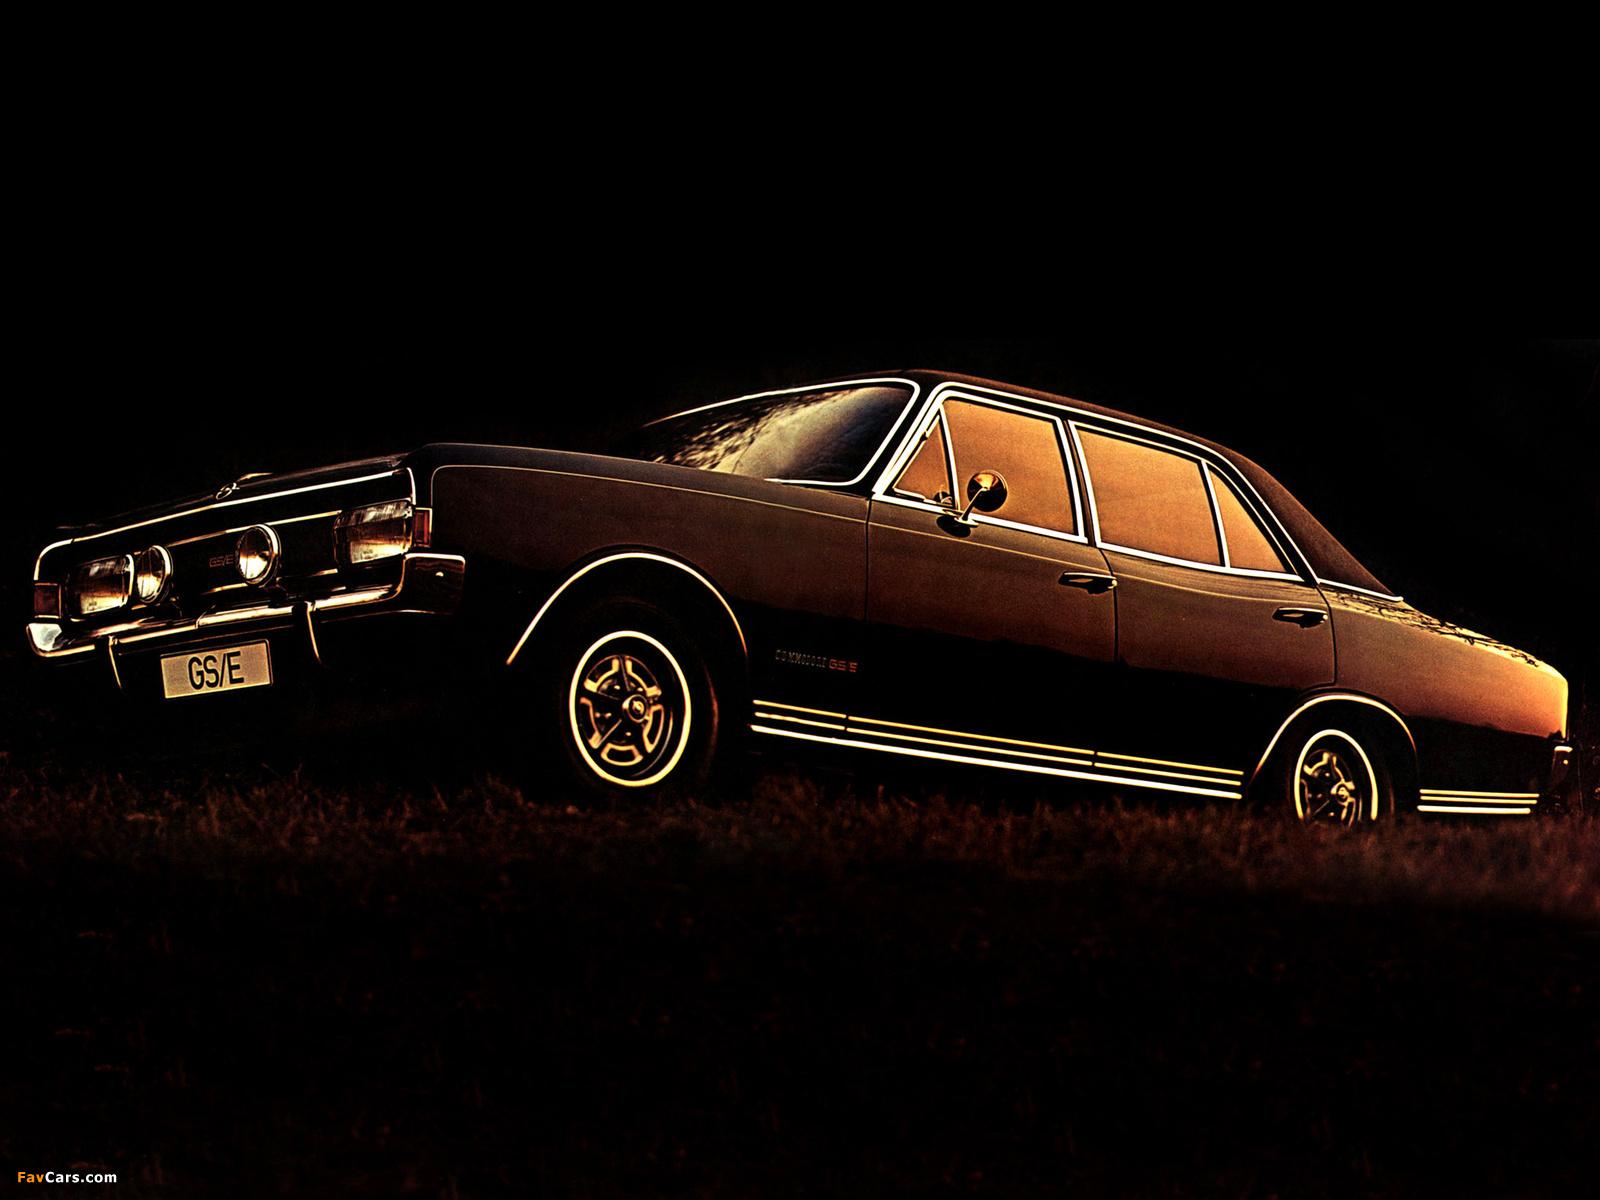 Opel Rekord (E2) 1982